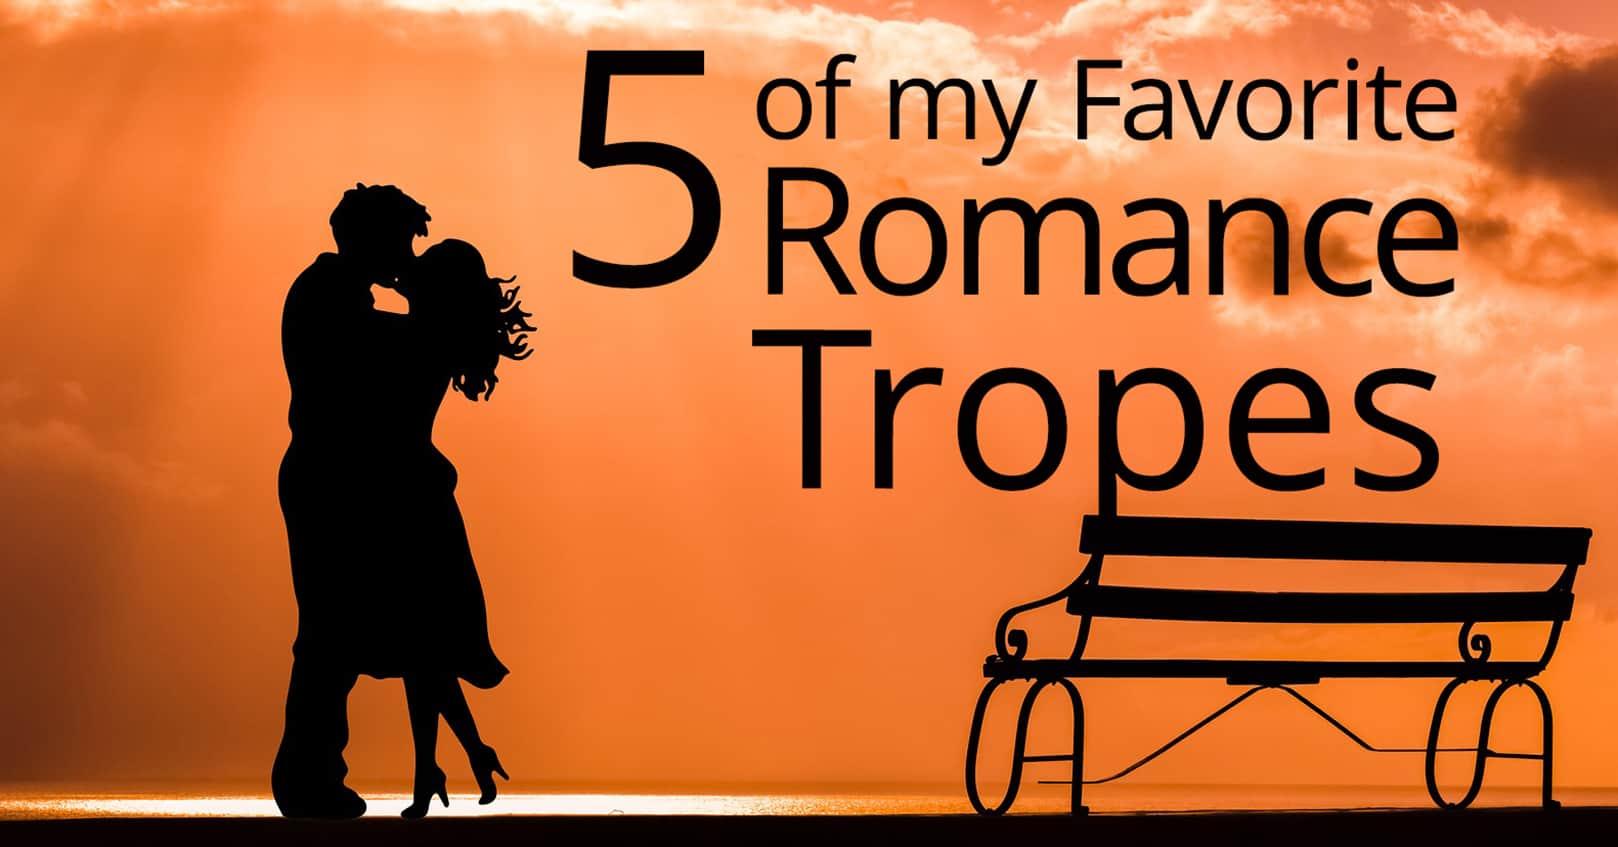 Favorite Romance Tropes